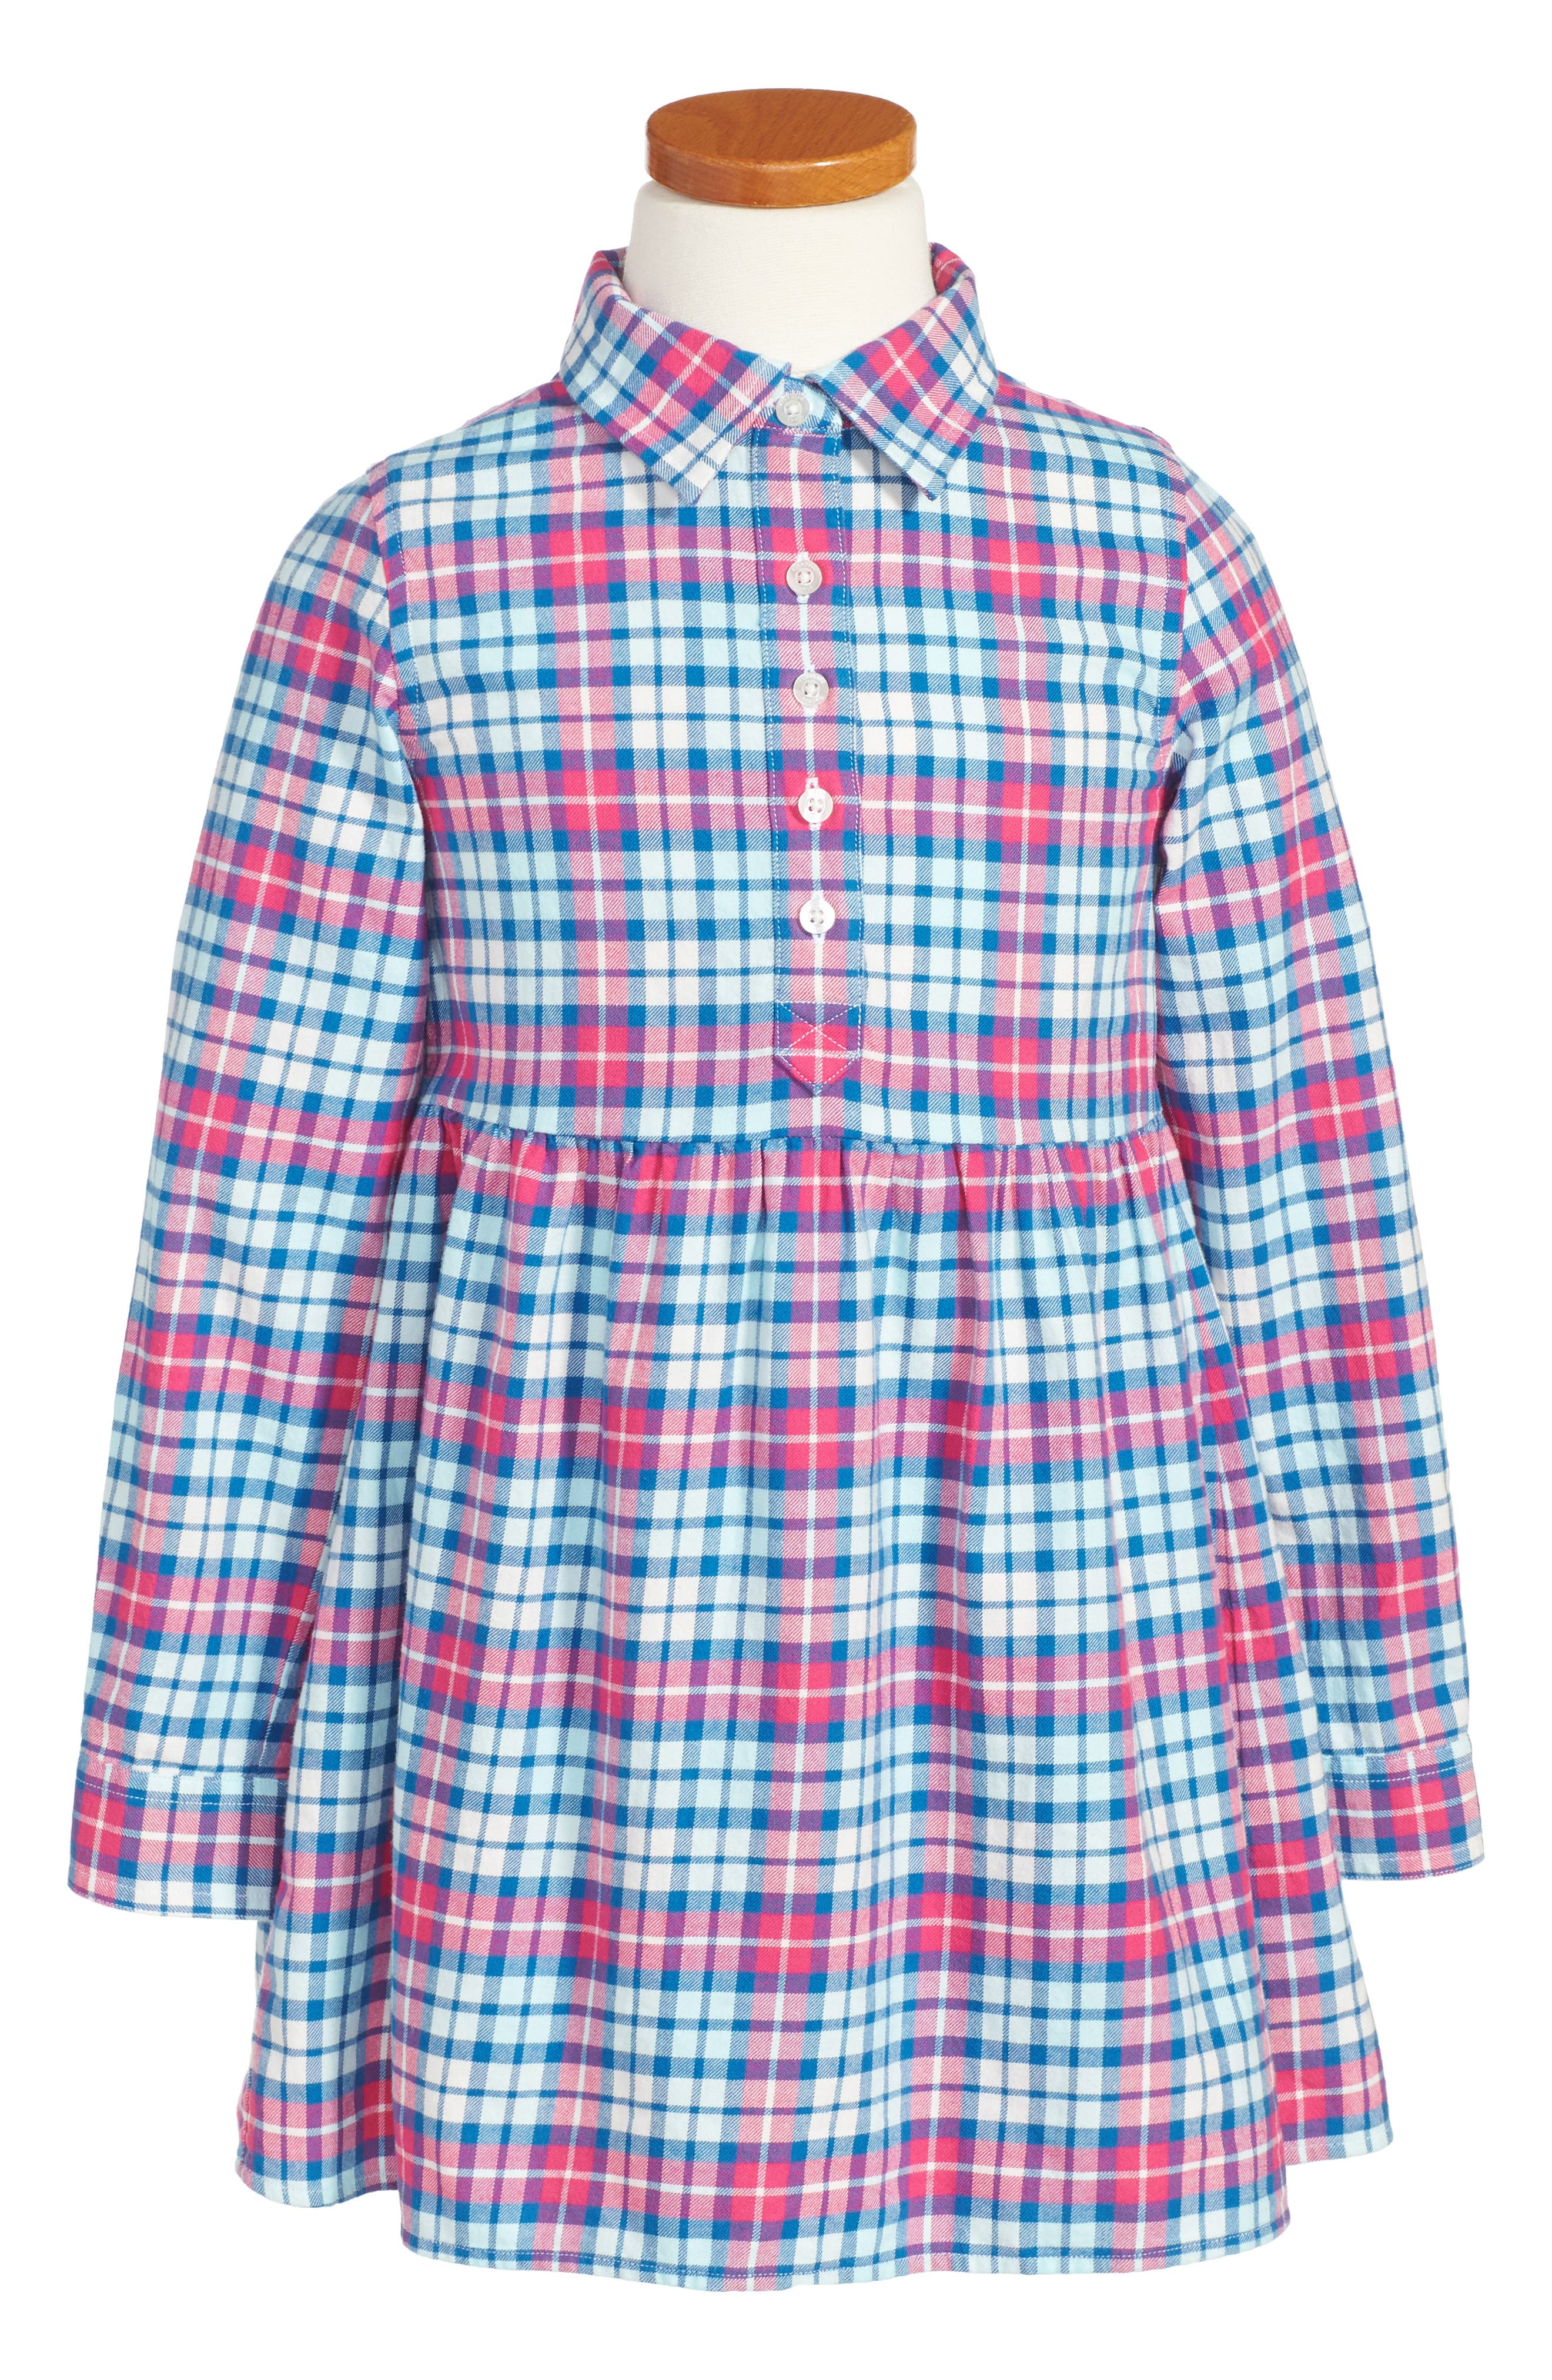 vineyard vines Piper Plaid Flannel Shirtdress (Toddler Girls, Little Girls & Big Girls)